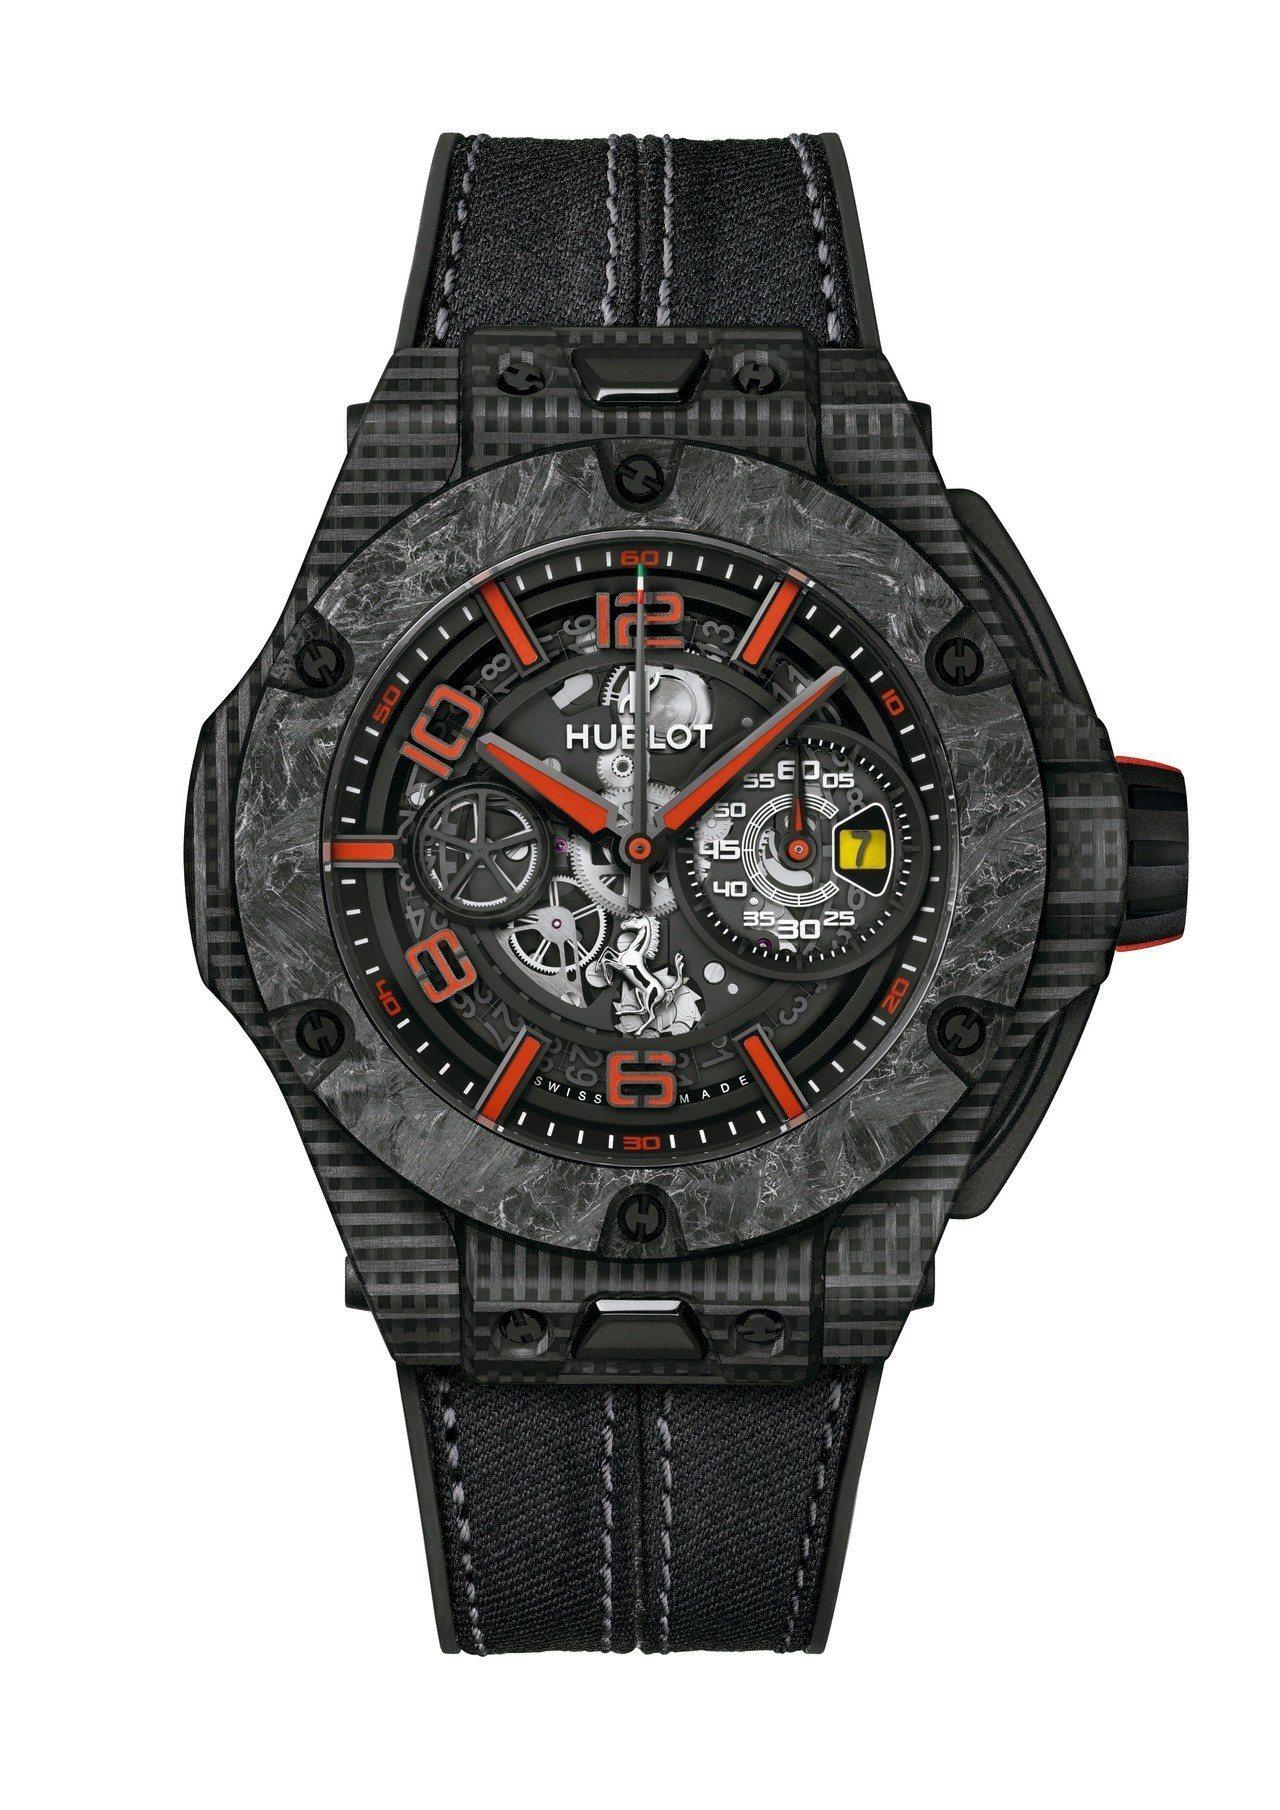 宇舶Big Bang Scuderia Ferrari紀念腕表,3D立體碳纖維表...